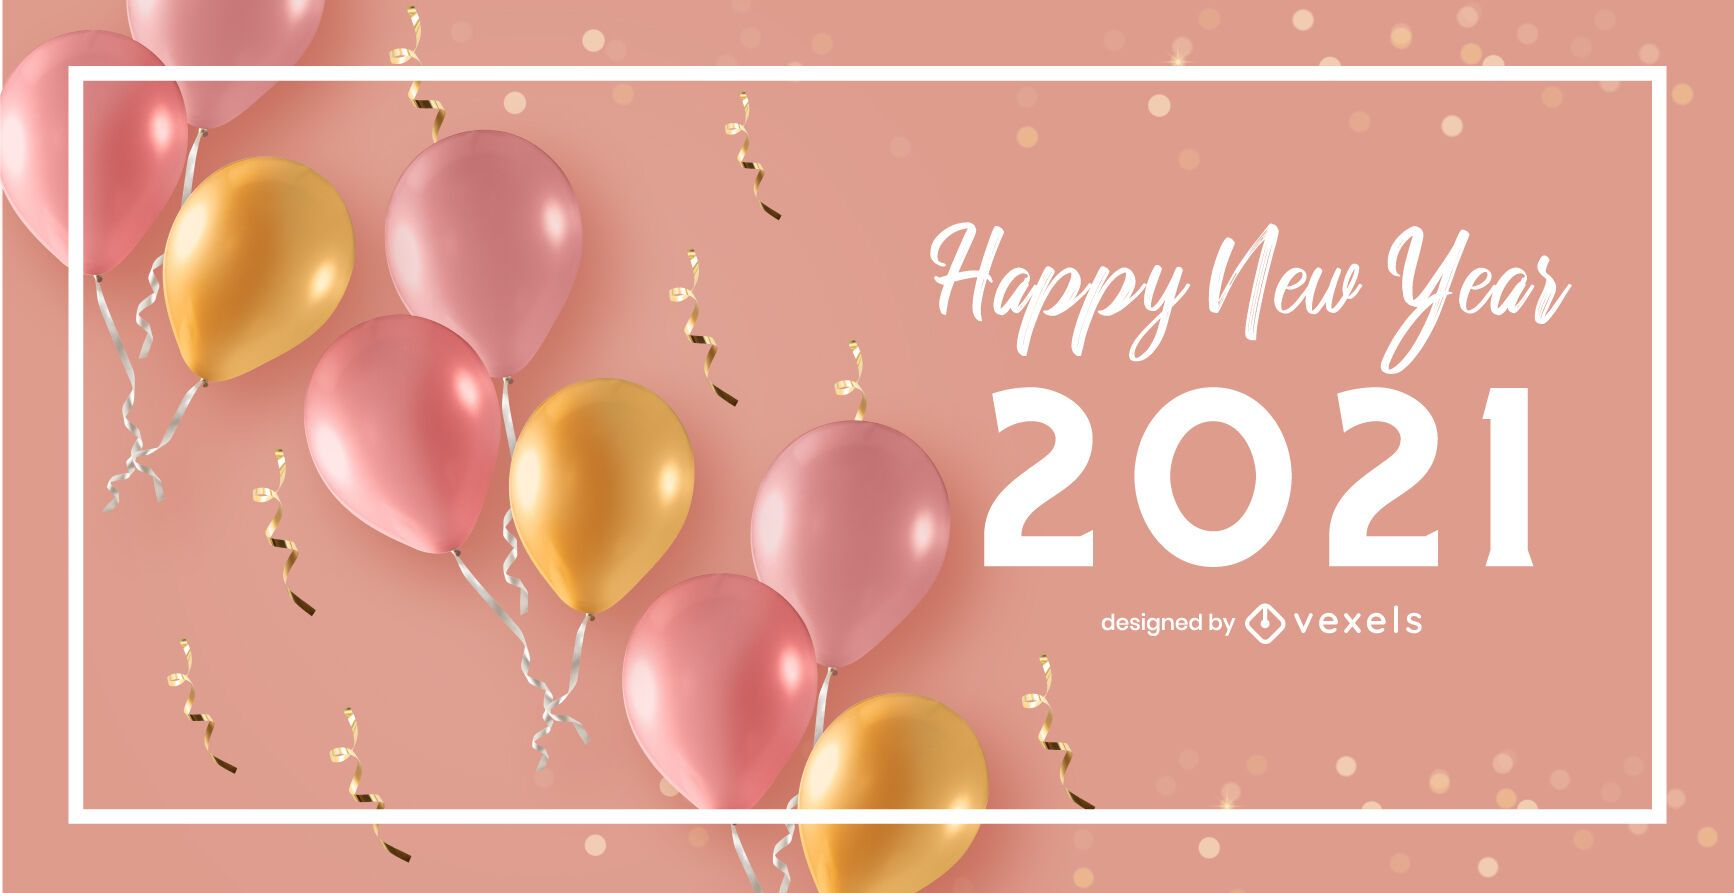 Happy new year 2021 celebration background design